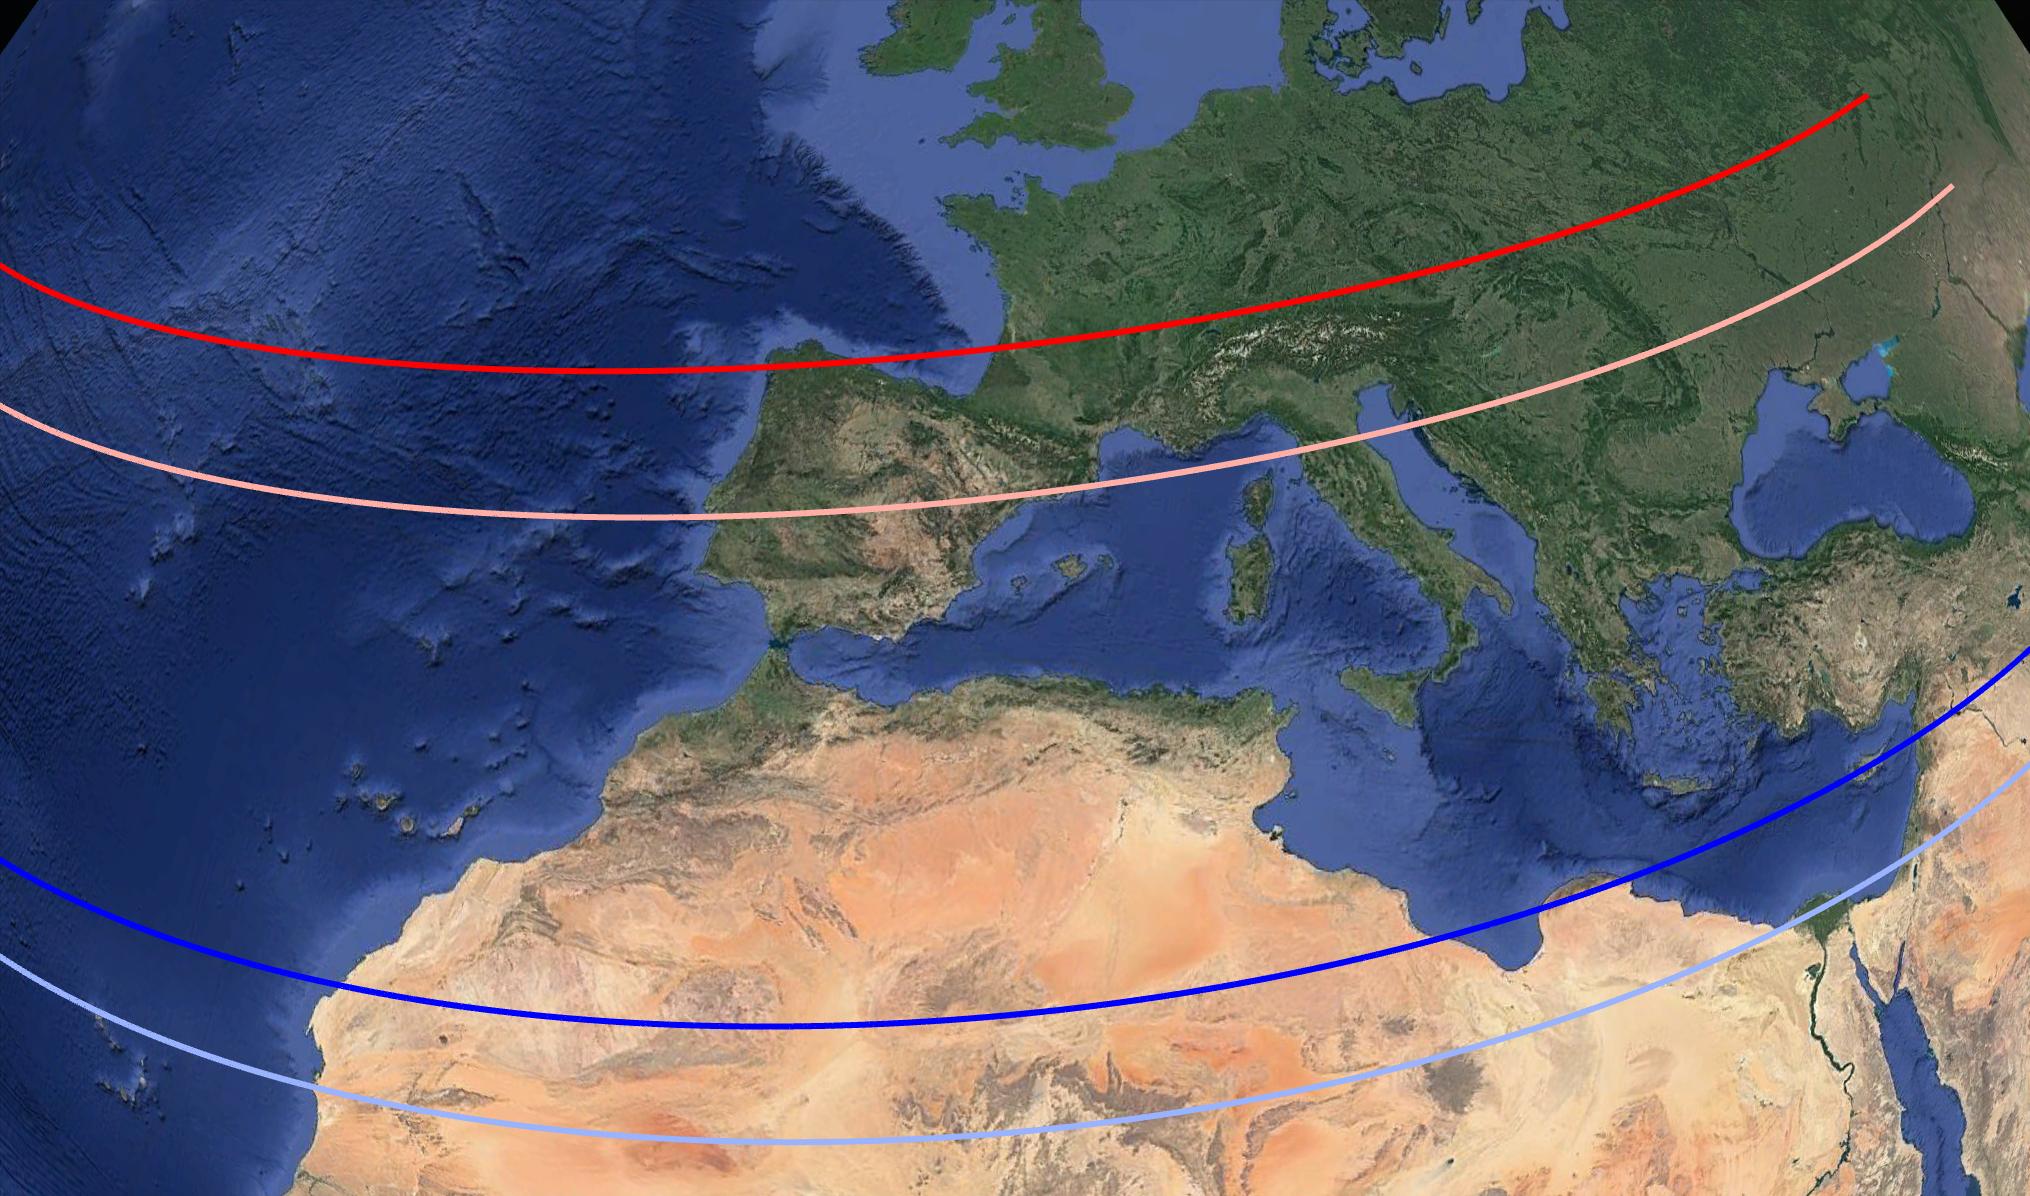 1567214636966-ESA_Gaia_Triton_Map_prediction.png